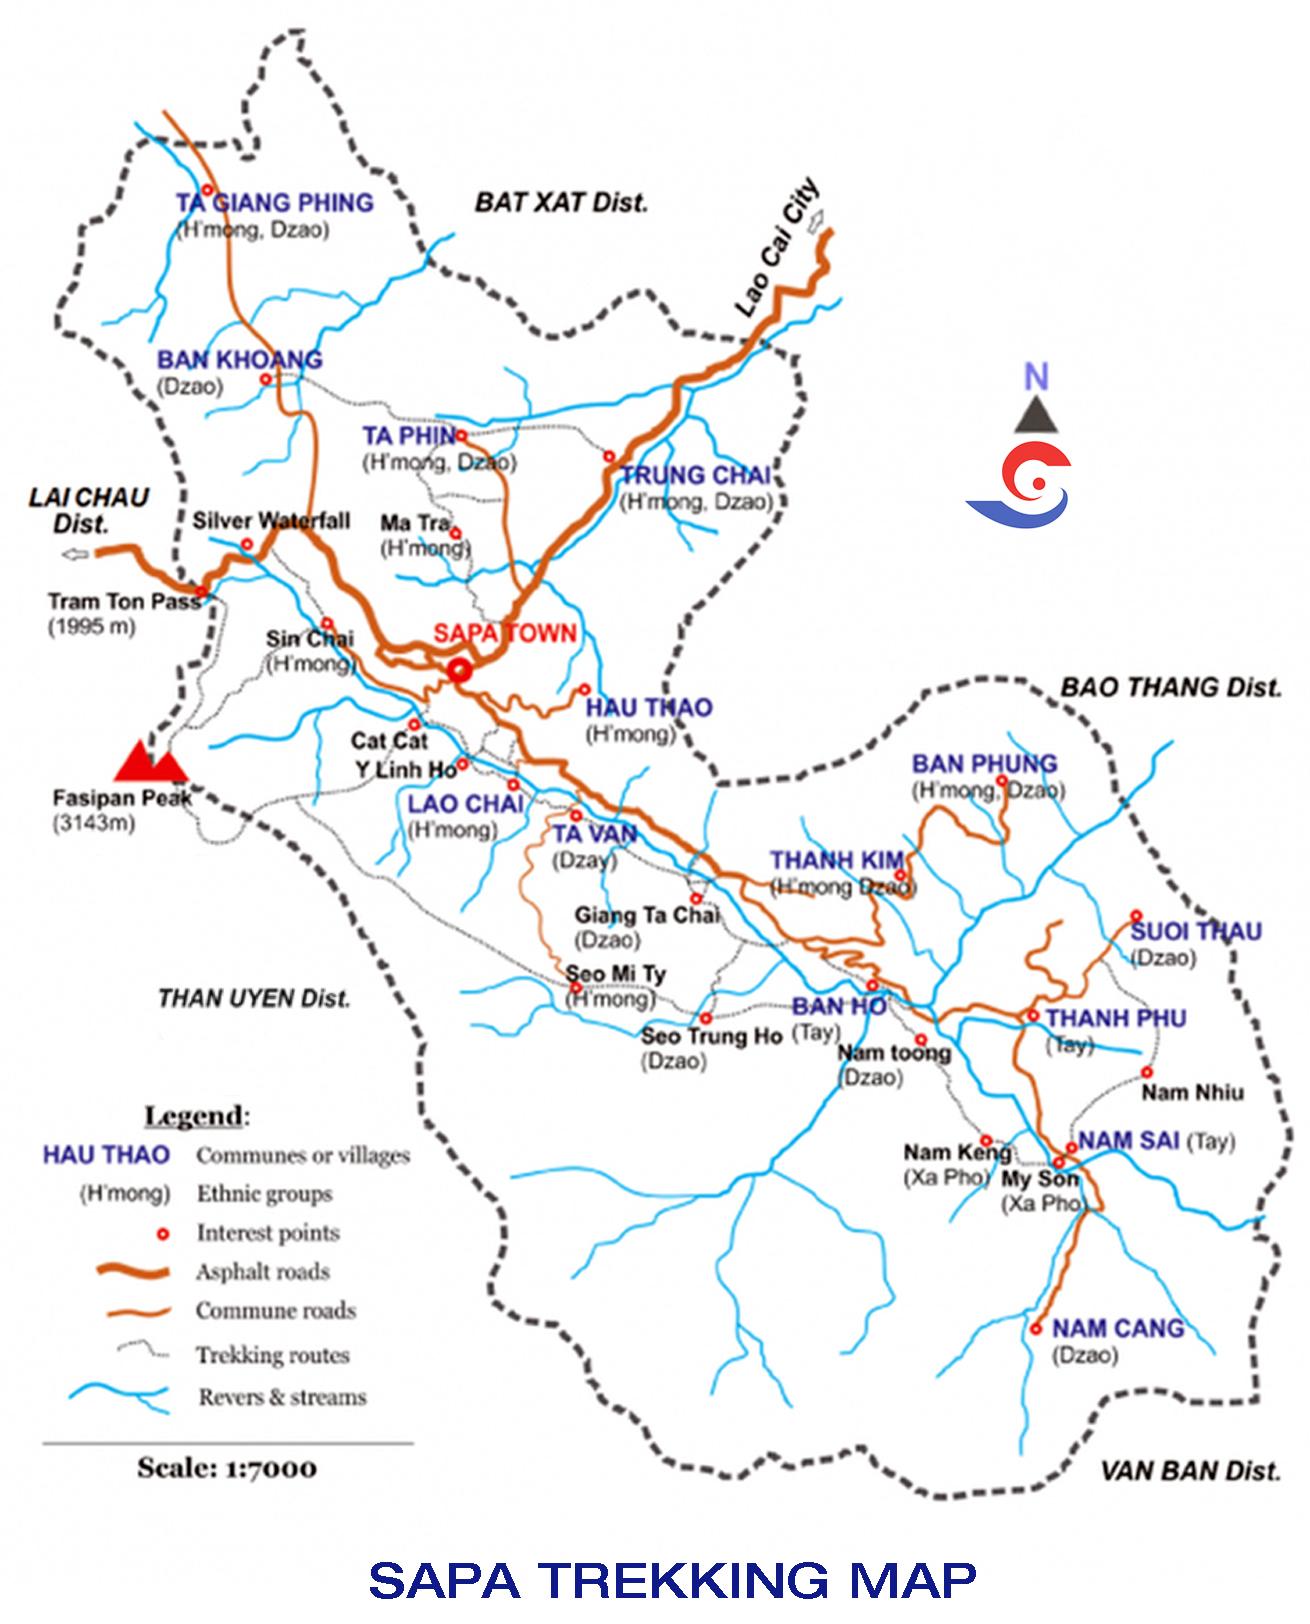 Sapa-Trekking-Map-Sapa-Tours-From-Hanoi